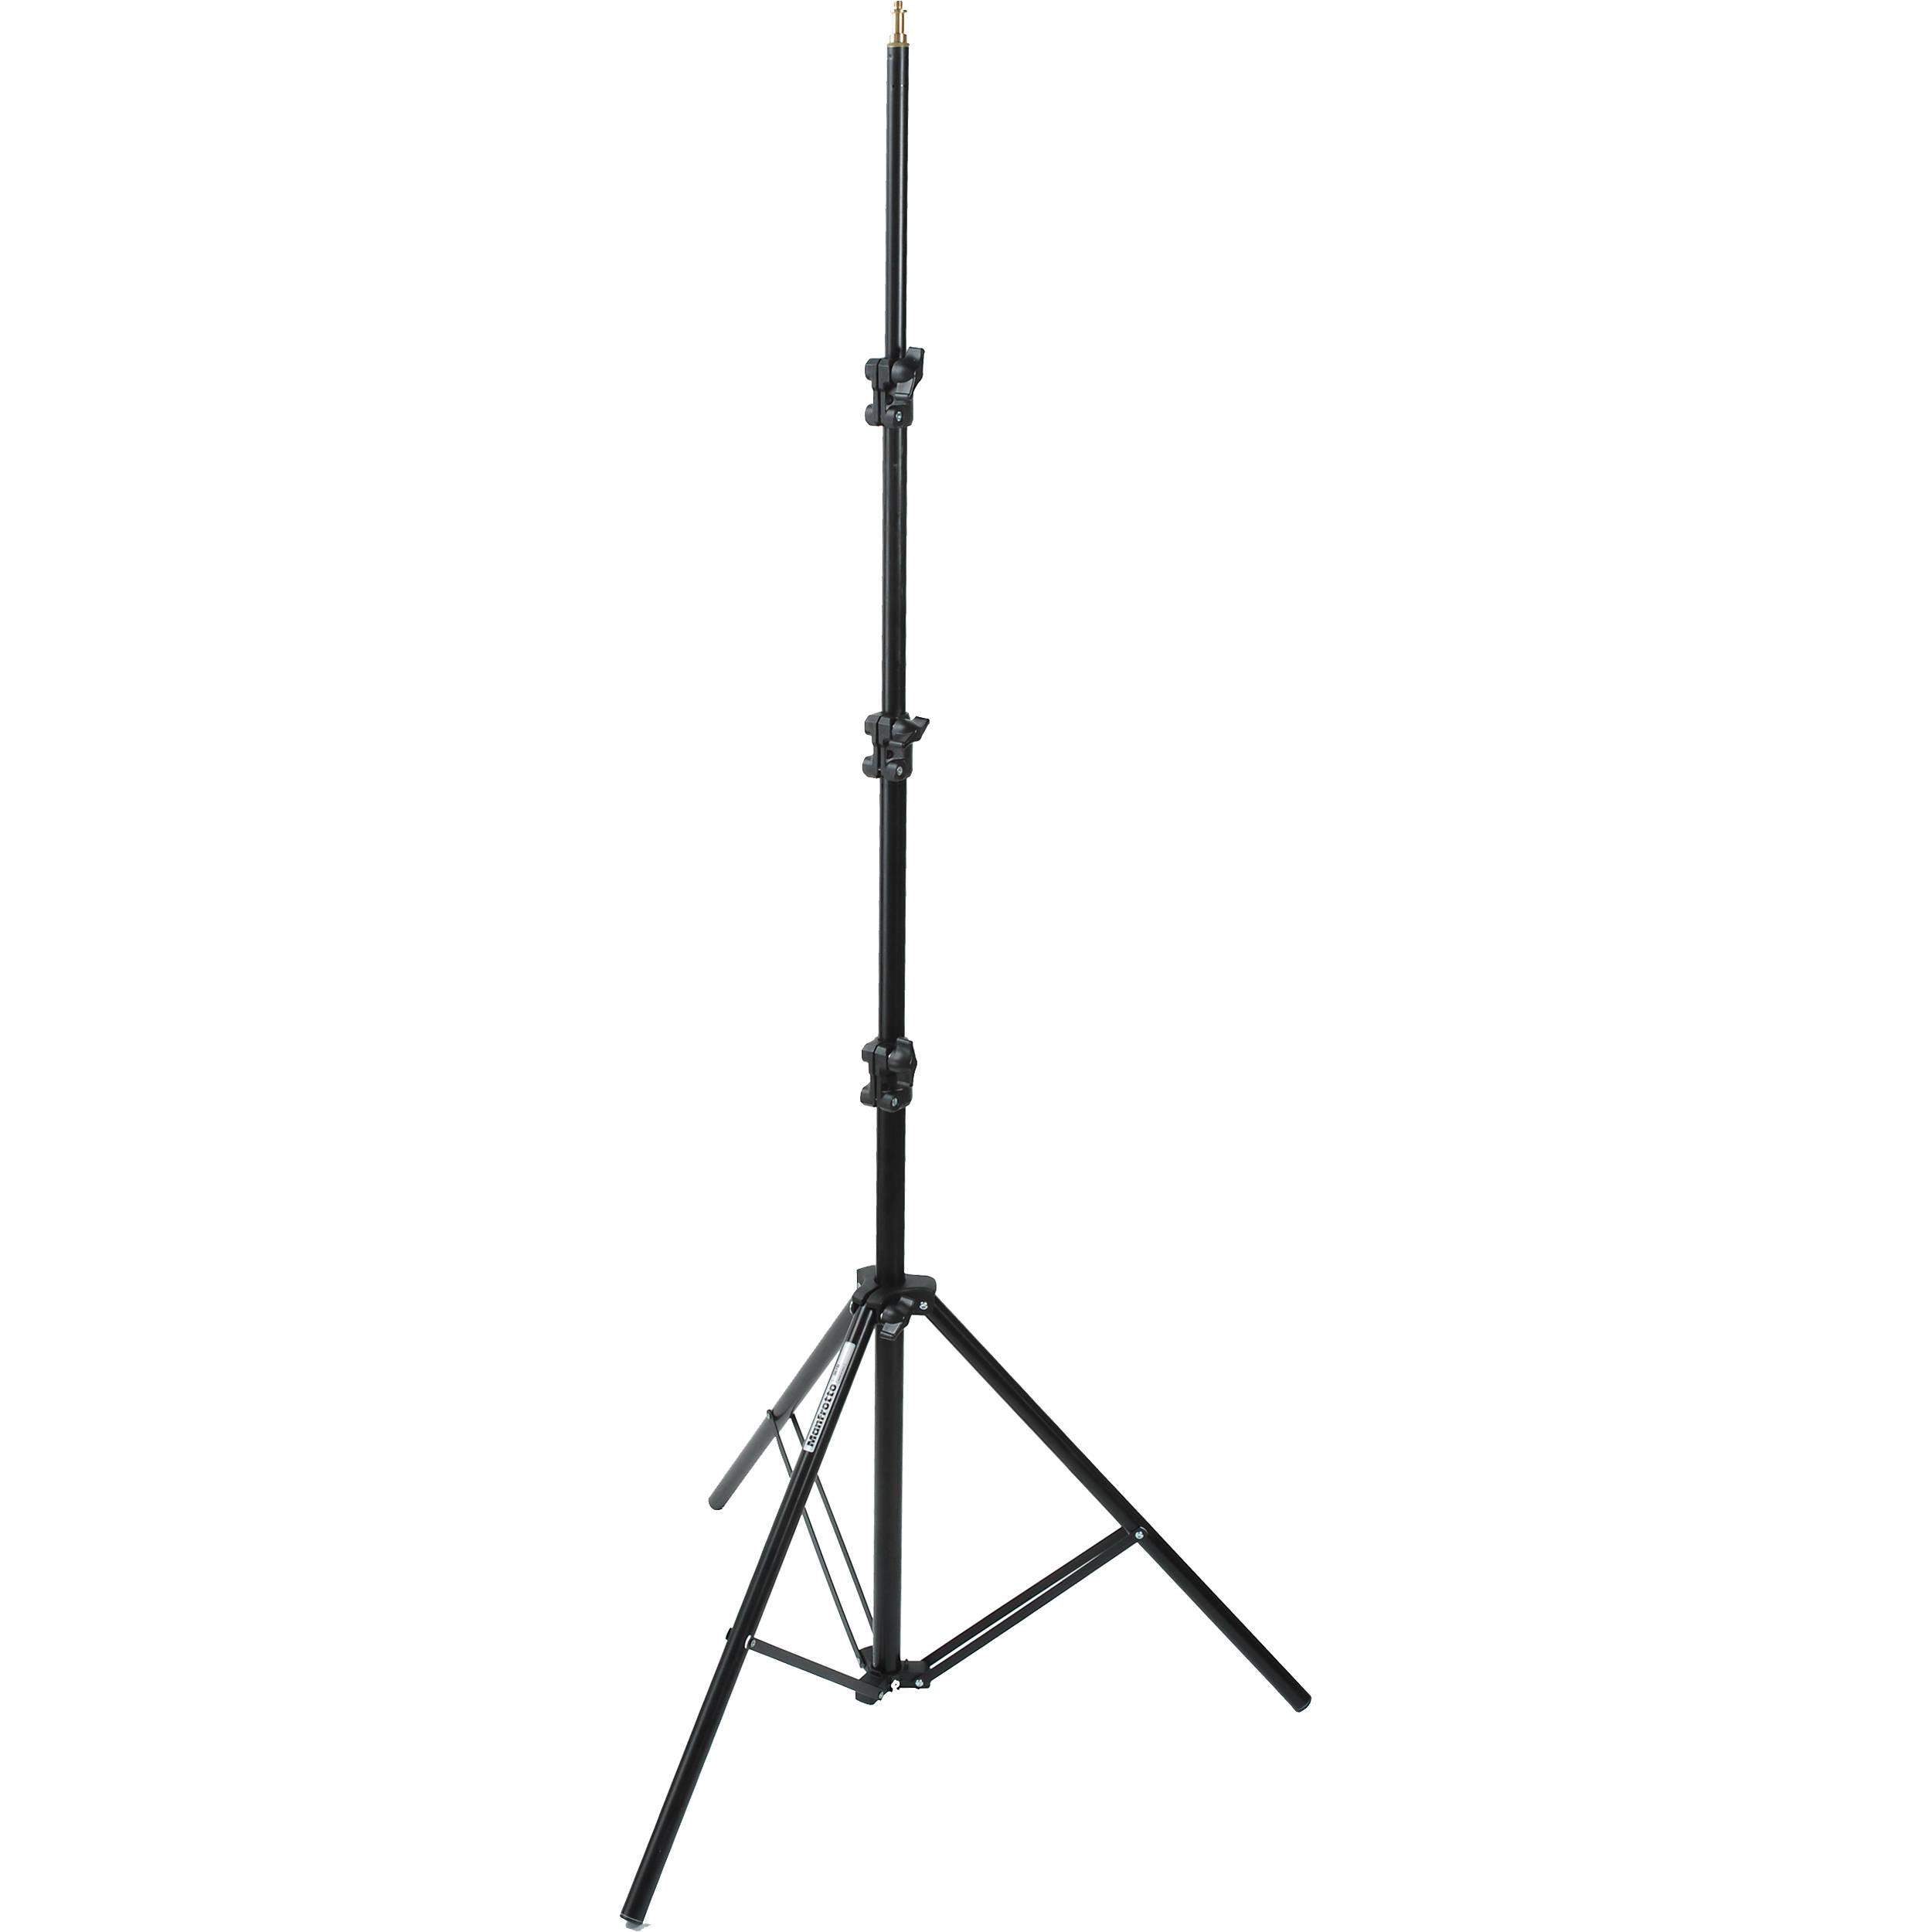 Manfrotto 367b Basic Light Stand 9 27m Bh Photo Guitar Humbucker Coax Wiring Diagrams